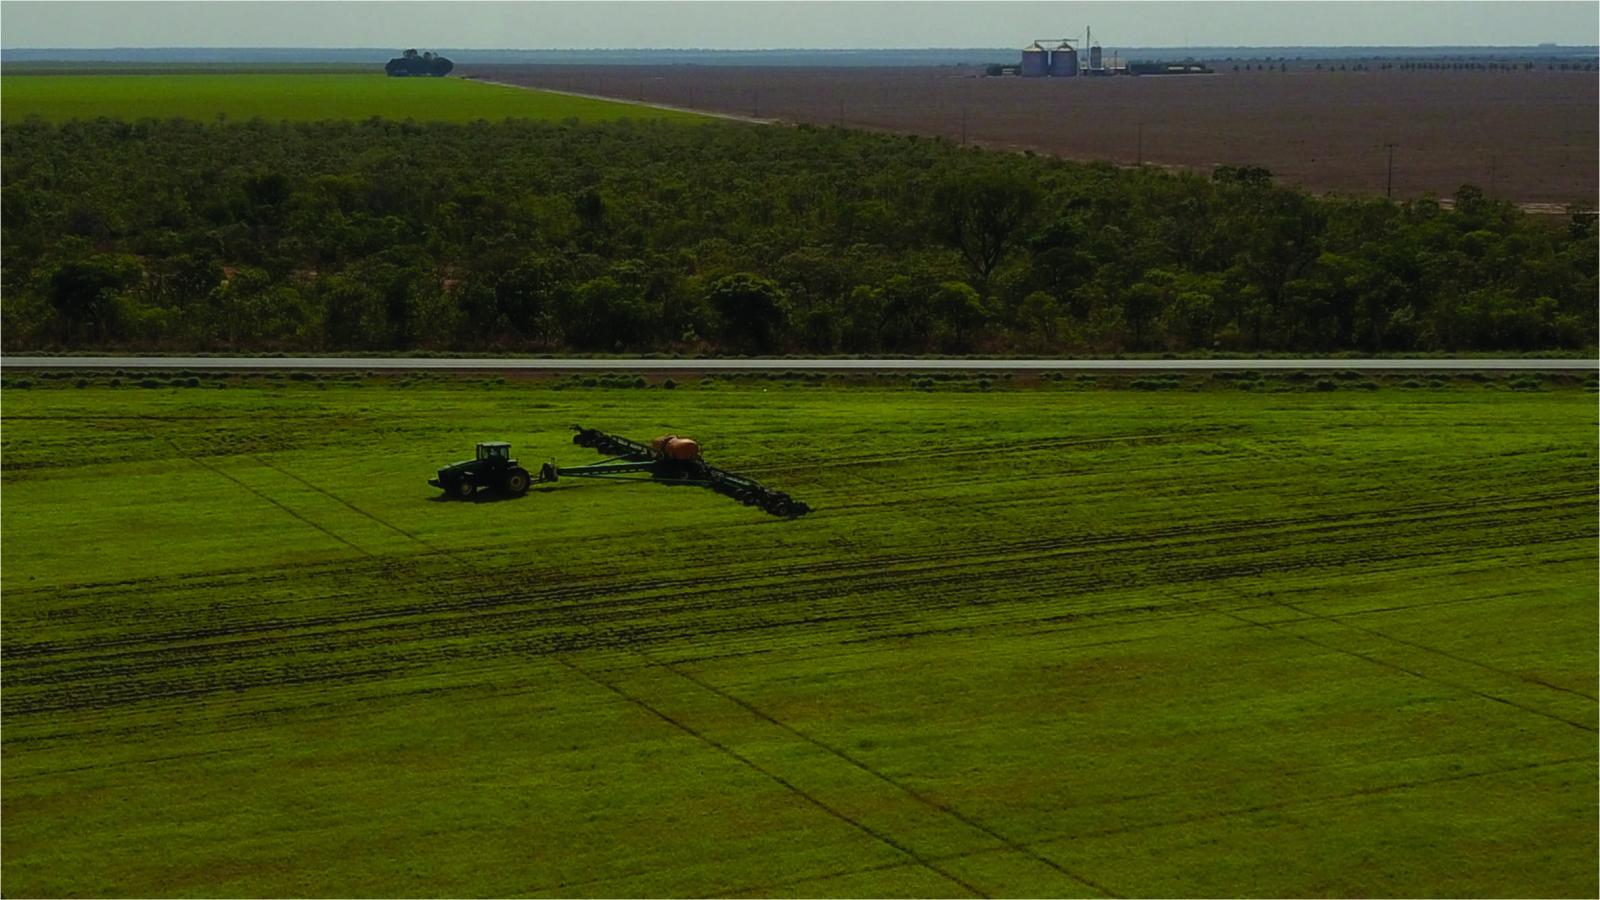 images/2018/04/carroll-farms-farmstead-45-gb1-1523484318mtuymzq4ndmxoa.jpg